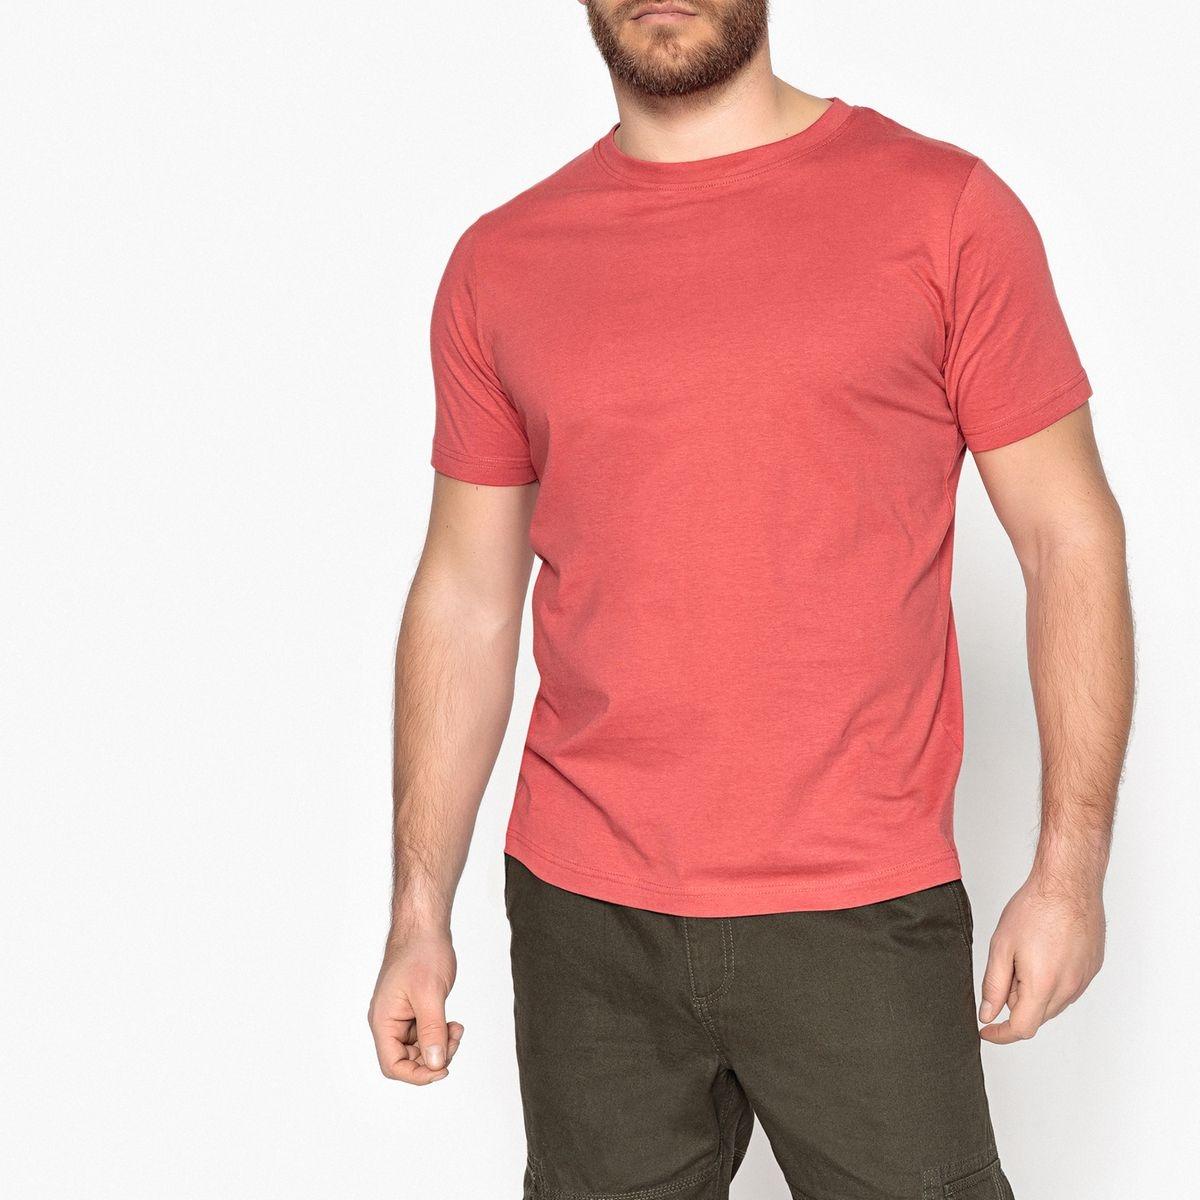 Tee shirt col rond uni, manches courtes